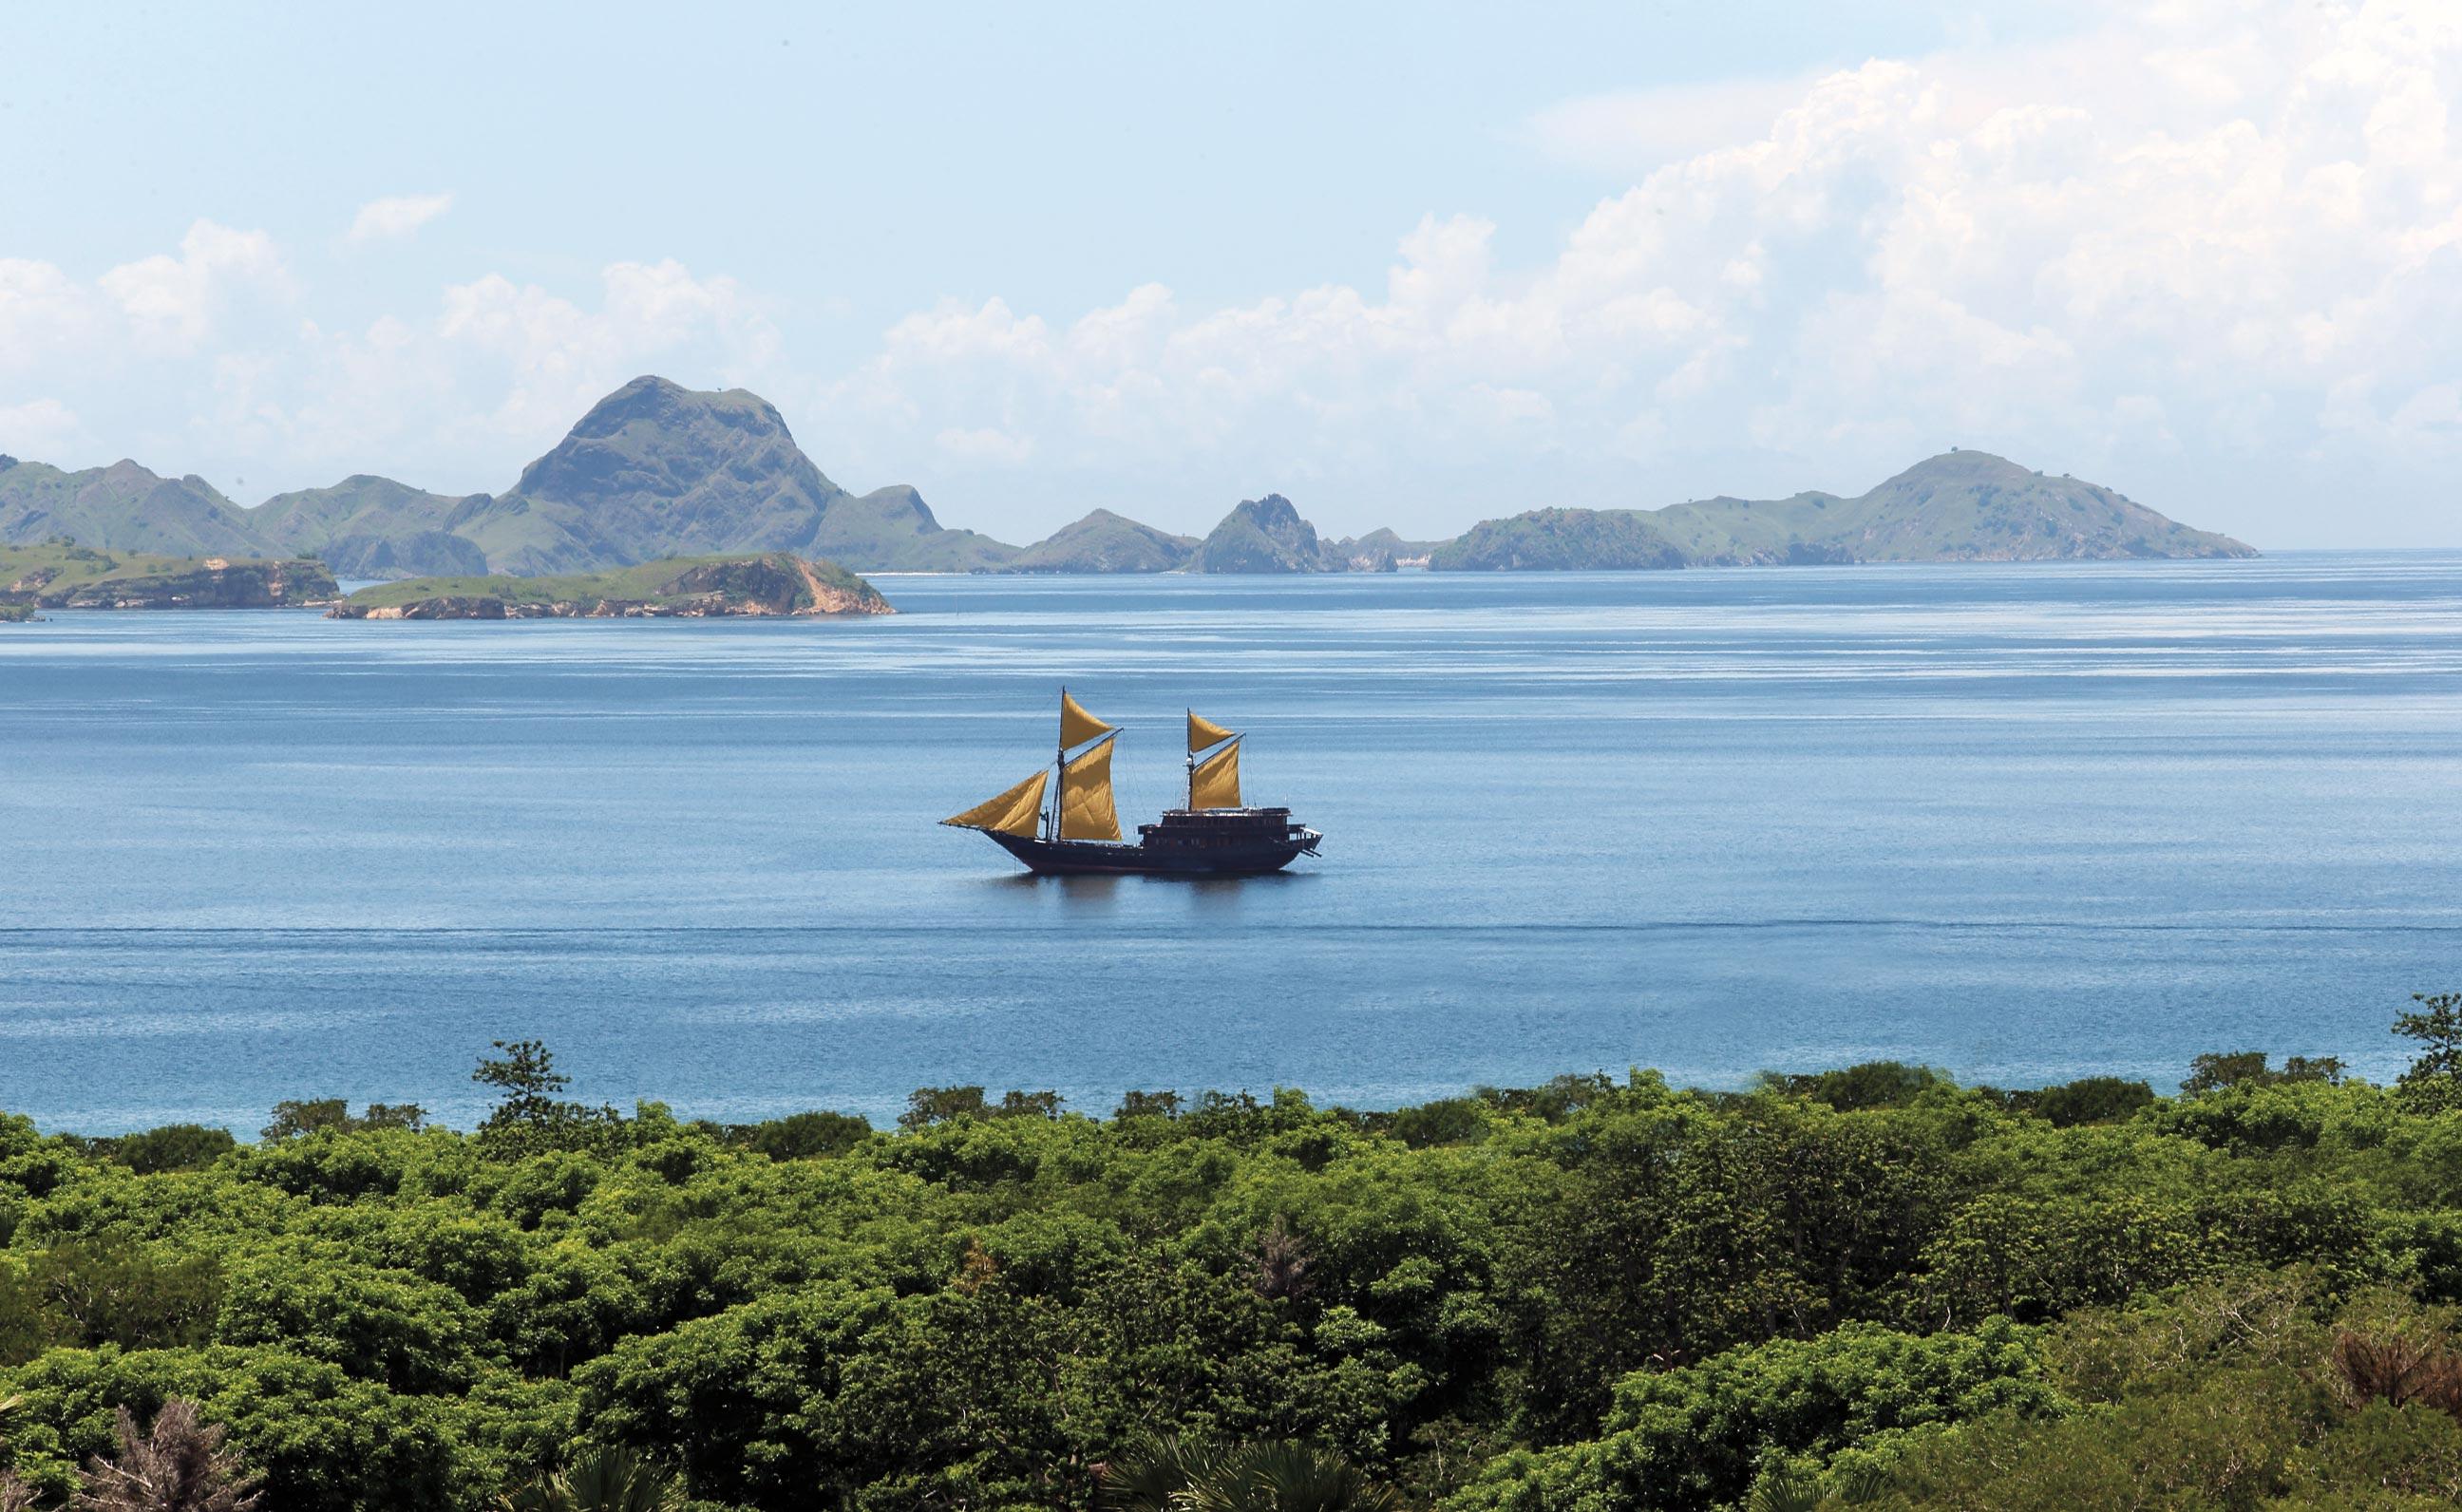 The Alila Purnama cruises through the Komodo Islands.